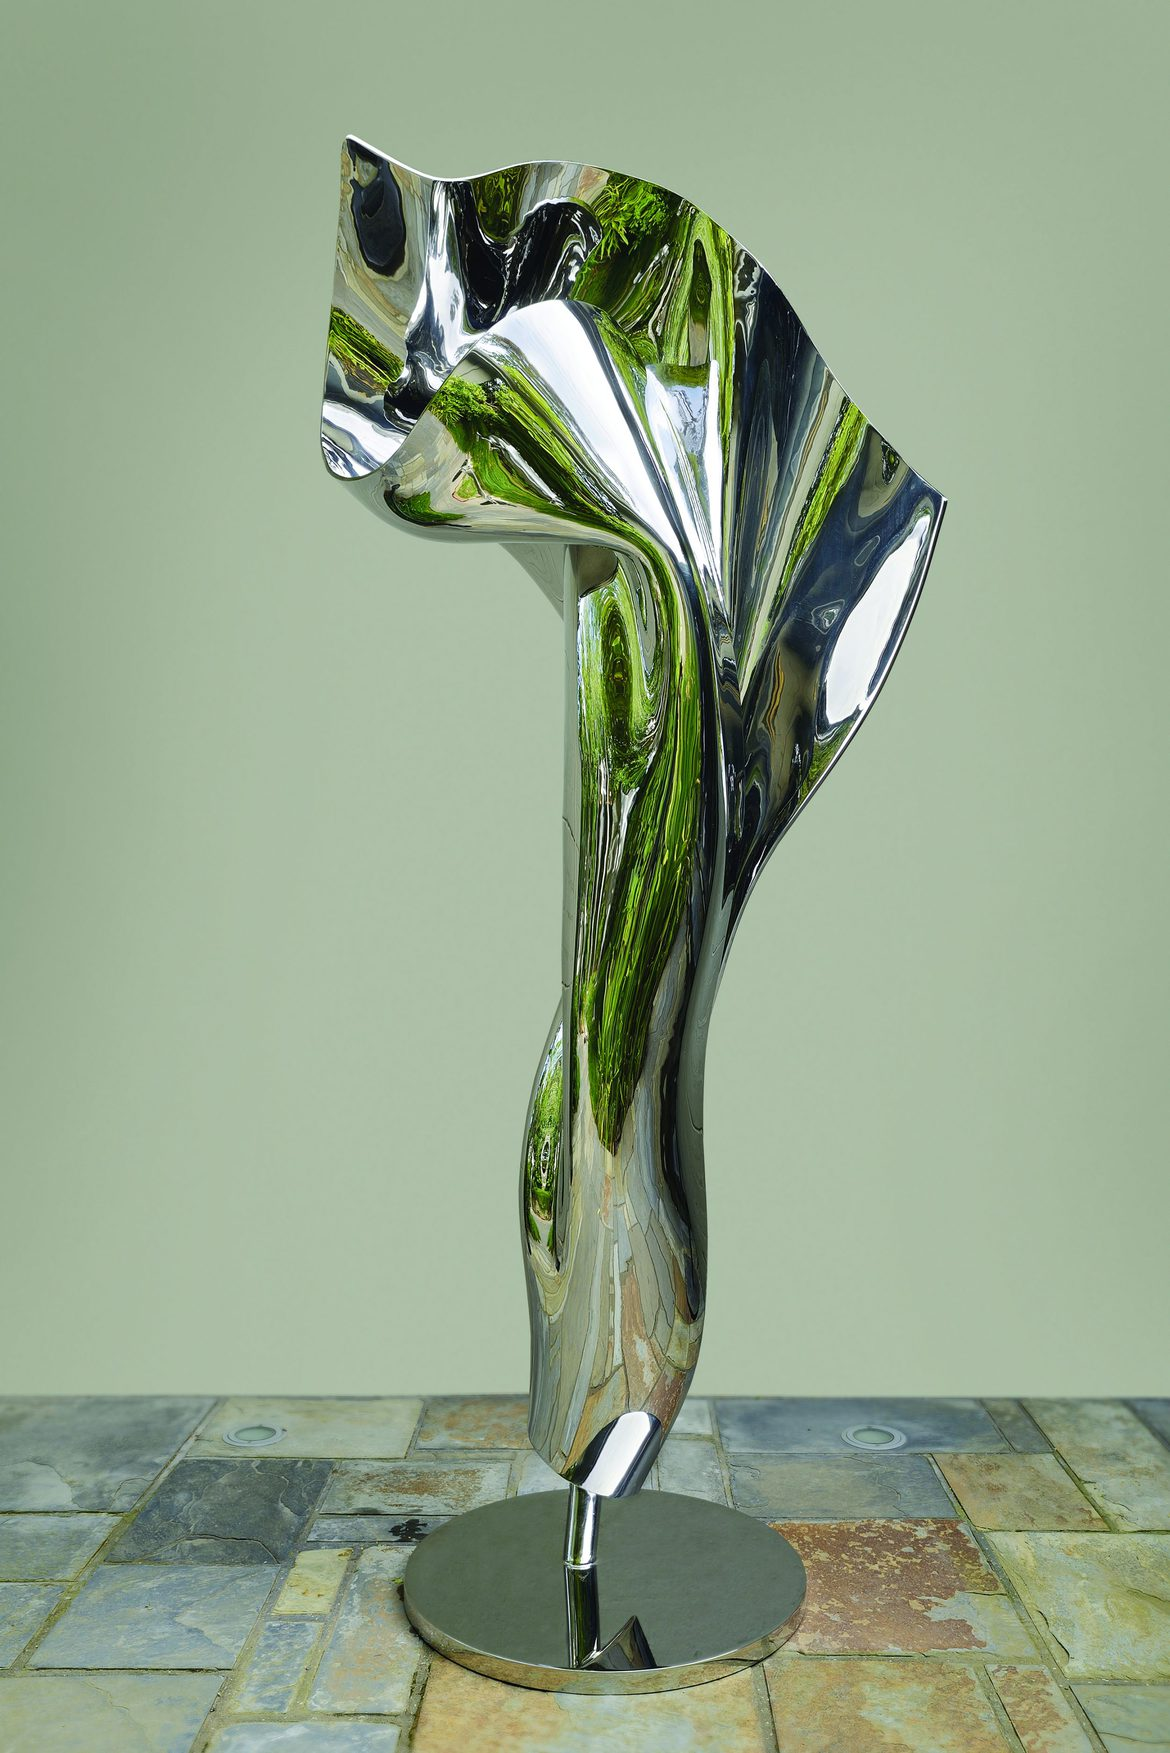 'Tessera 0', 2019, stainless steel, 215 x 93 x 61 cm, edition 1 of 7 + 1AP